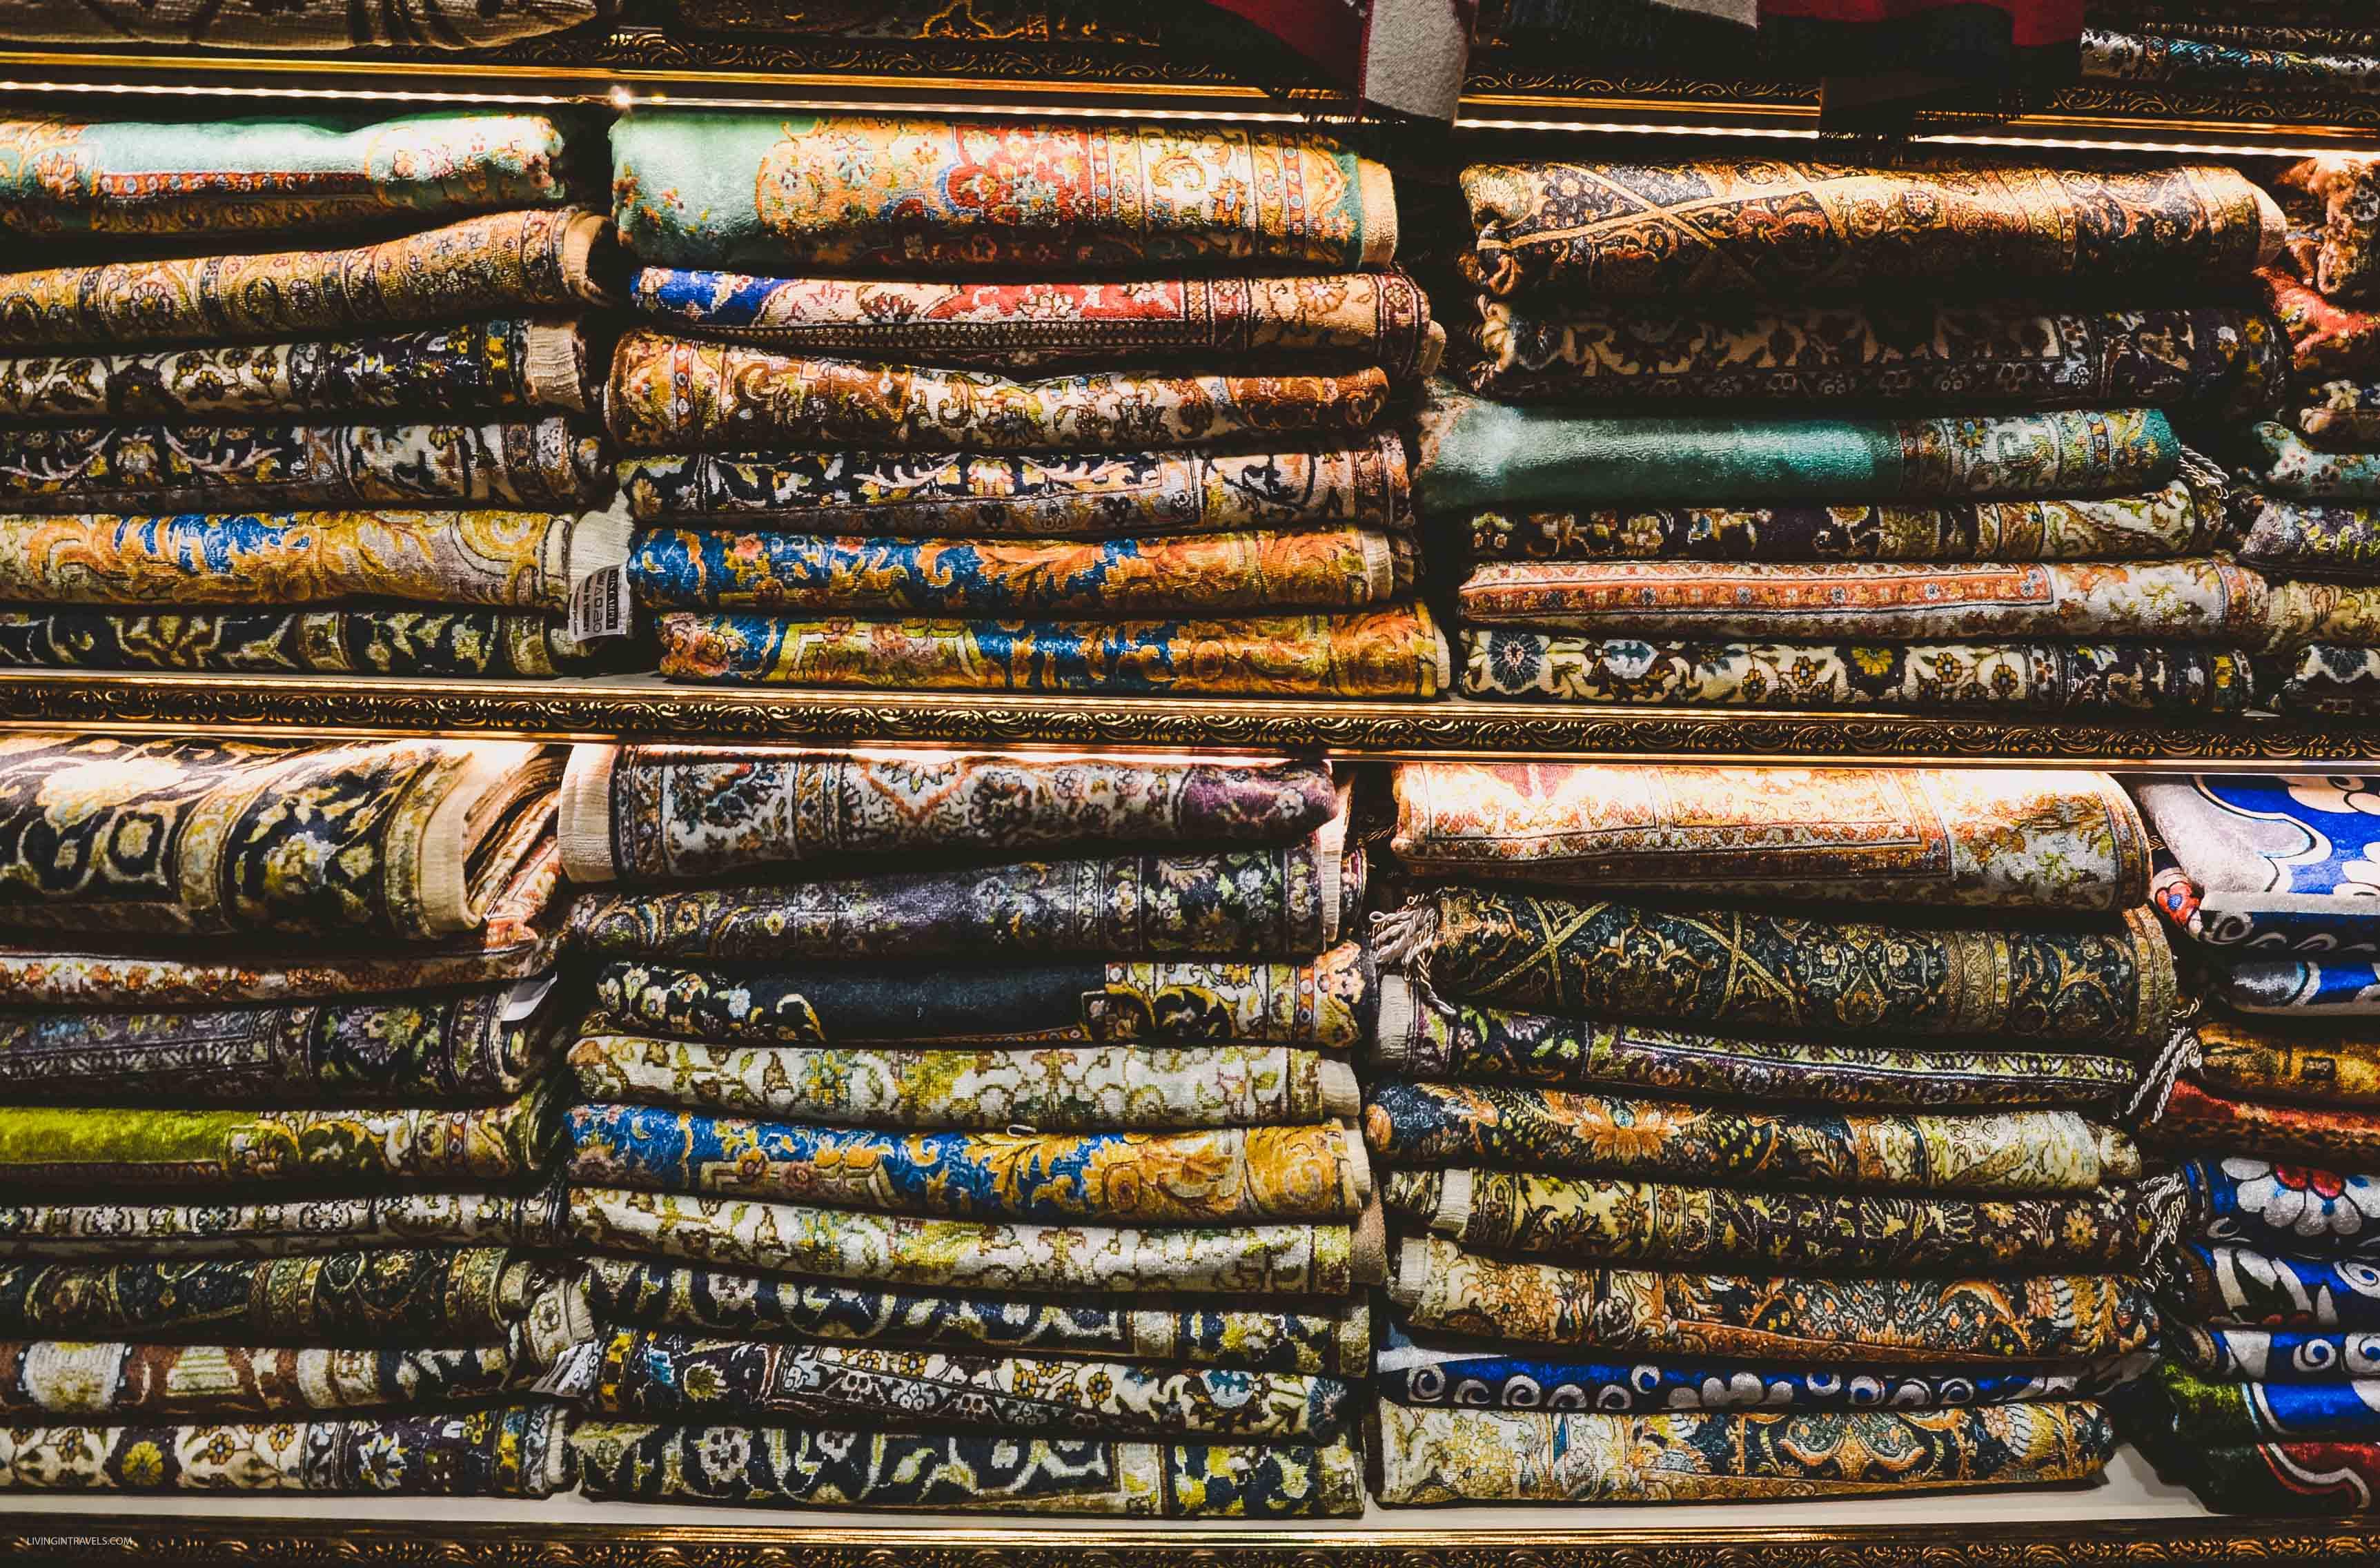 Гранд базар или лучший туристический аттракцион в Стамбуле